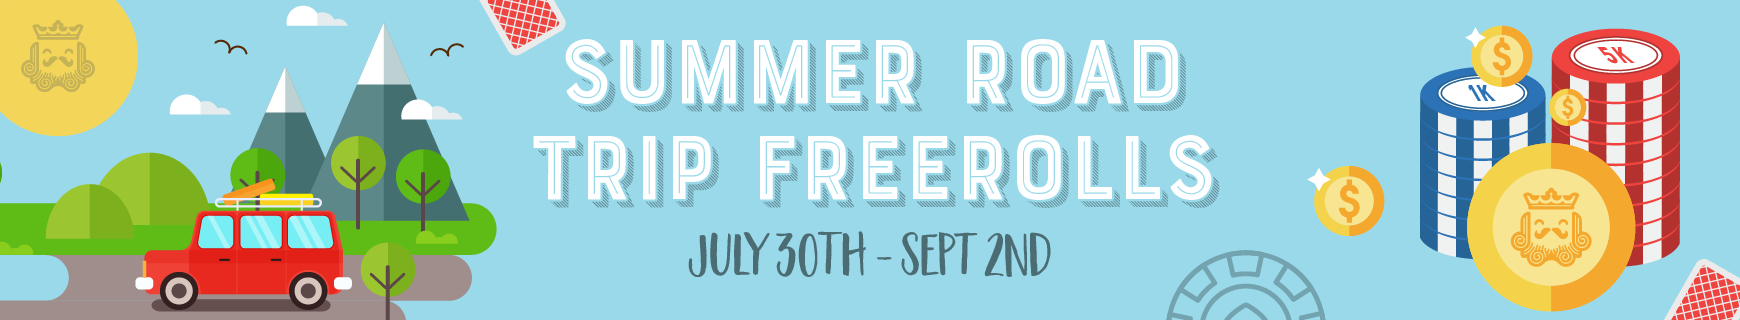 Summer road trip freerolls %28870 x 160%29 2x %281%29